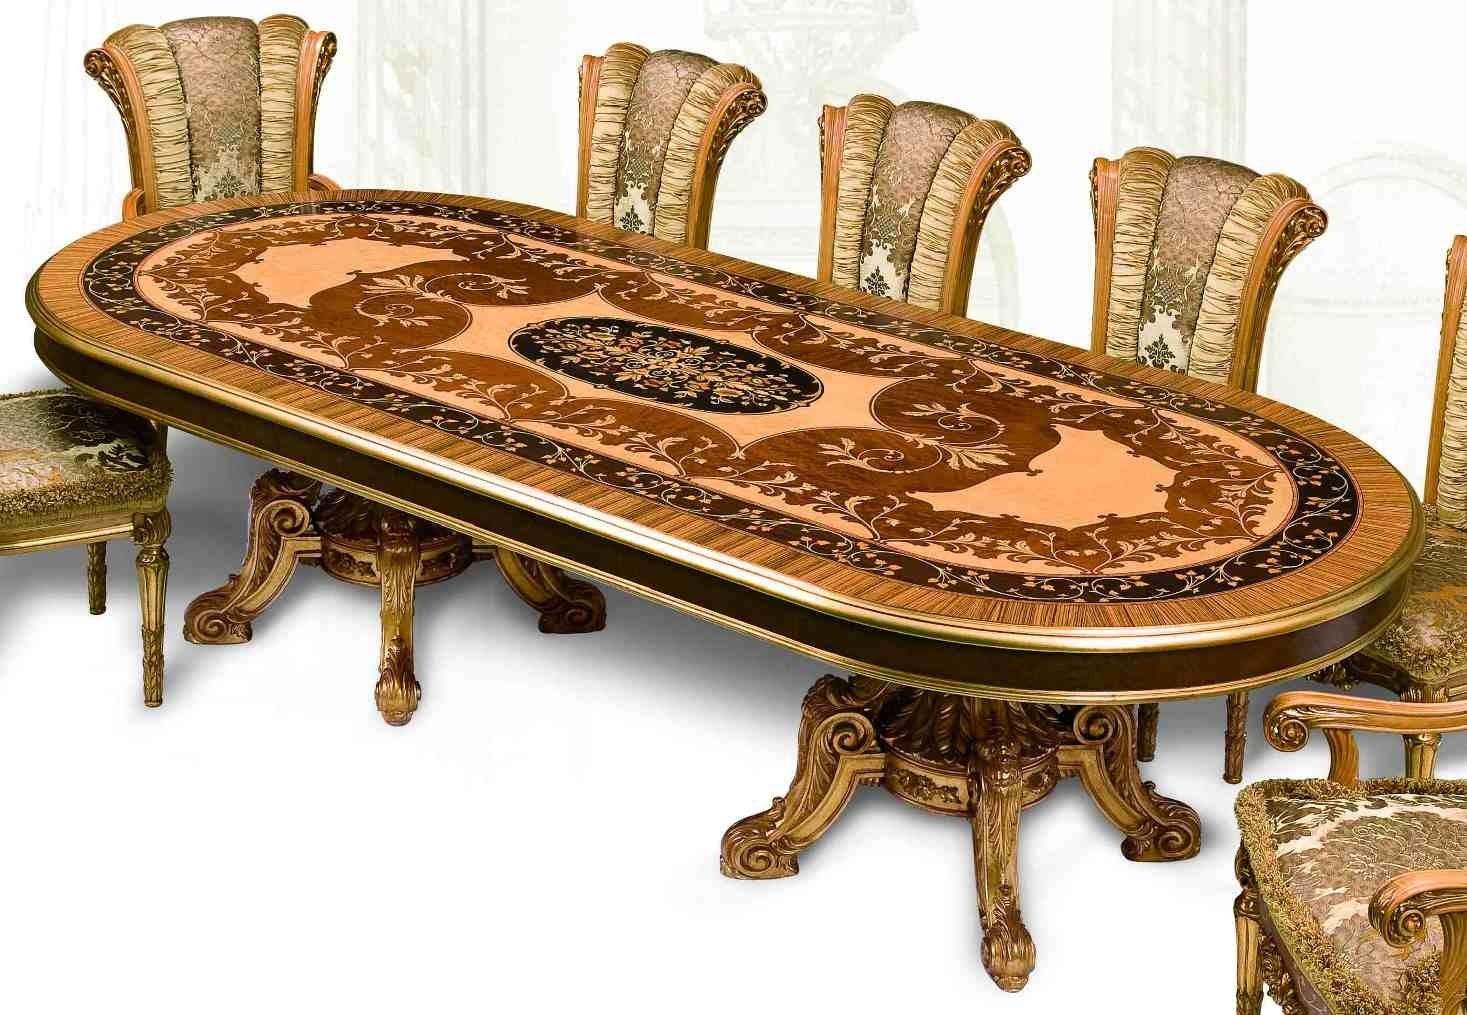 11 Luxury Dining Furniture Exquisite Empire Style Set